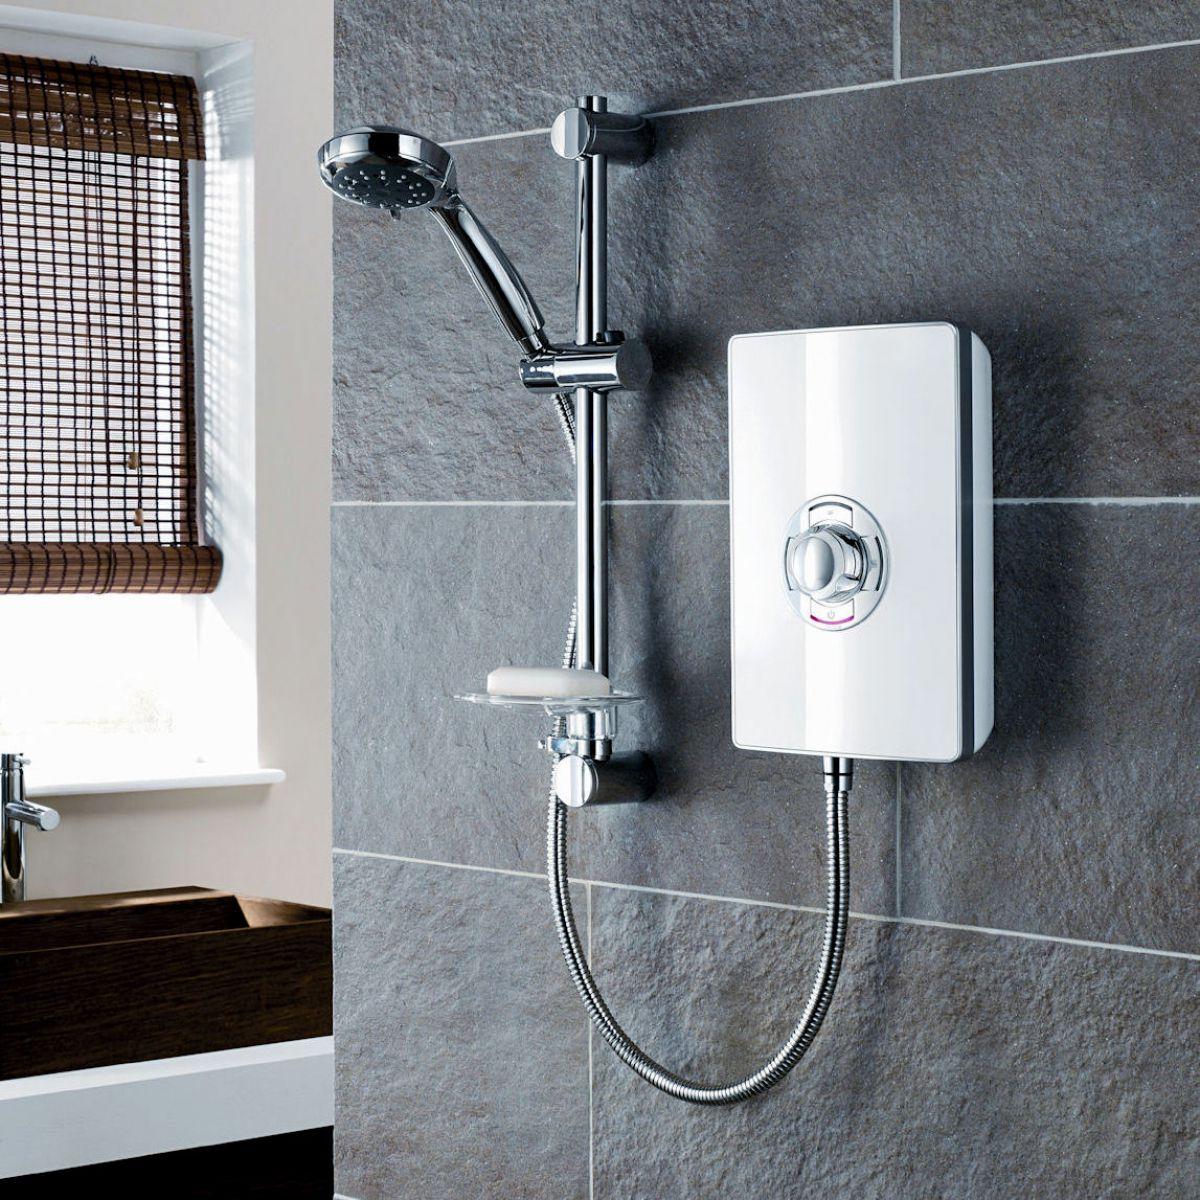 Triton aspirante electric shower white gloss uk bathrooms for Housse aspirante